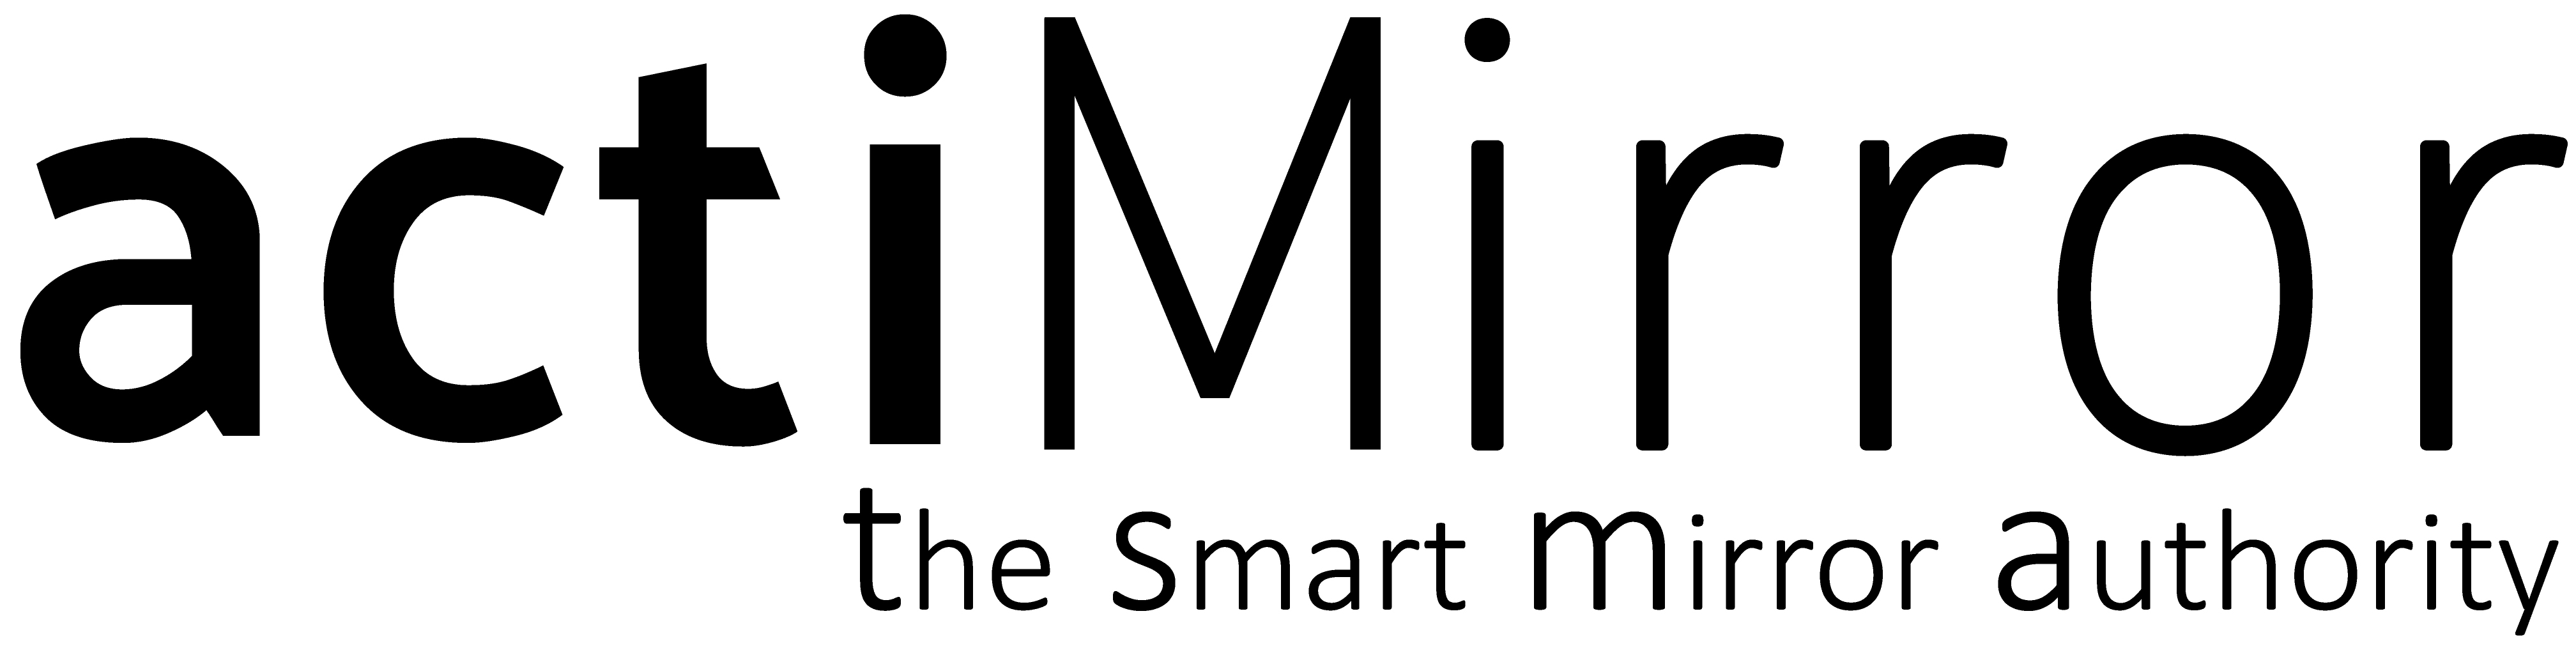 actiMirror-logo-AI.jpg